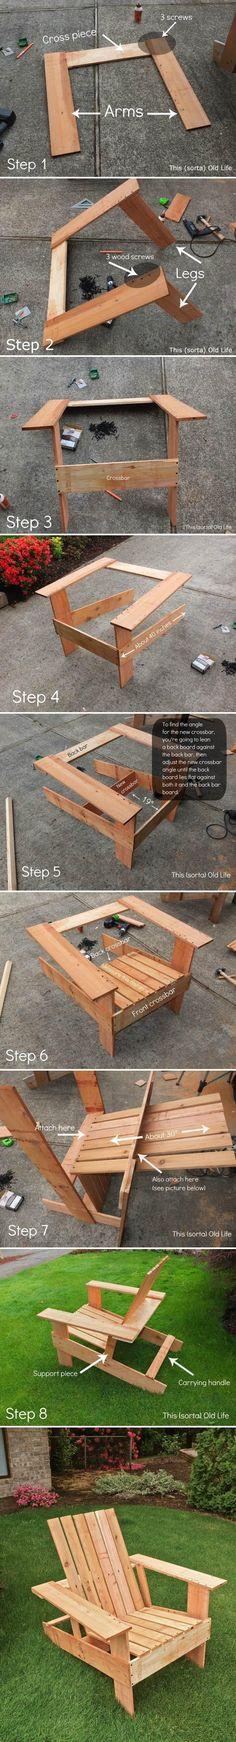 DIY lawn chair #tutorial